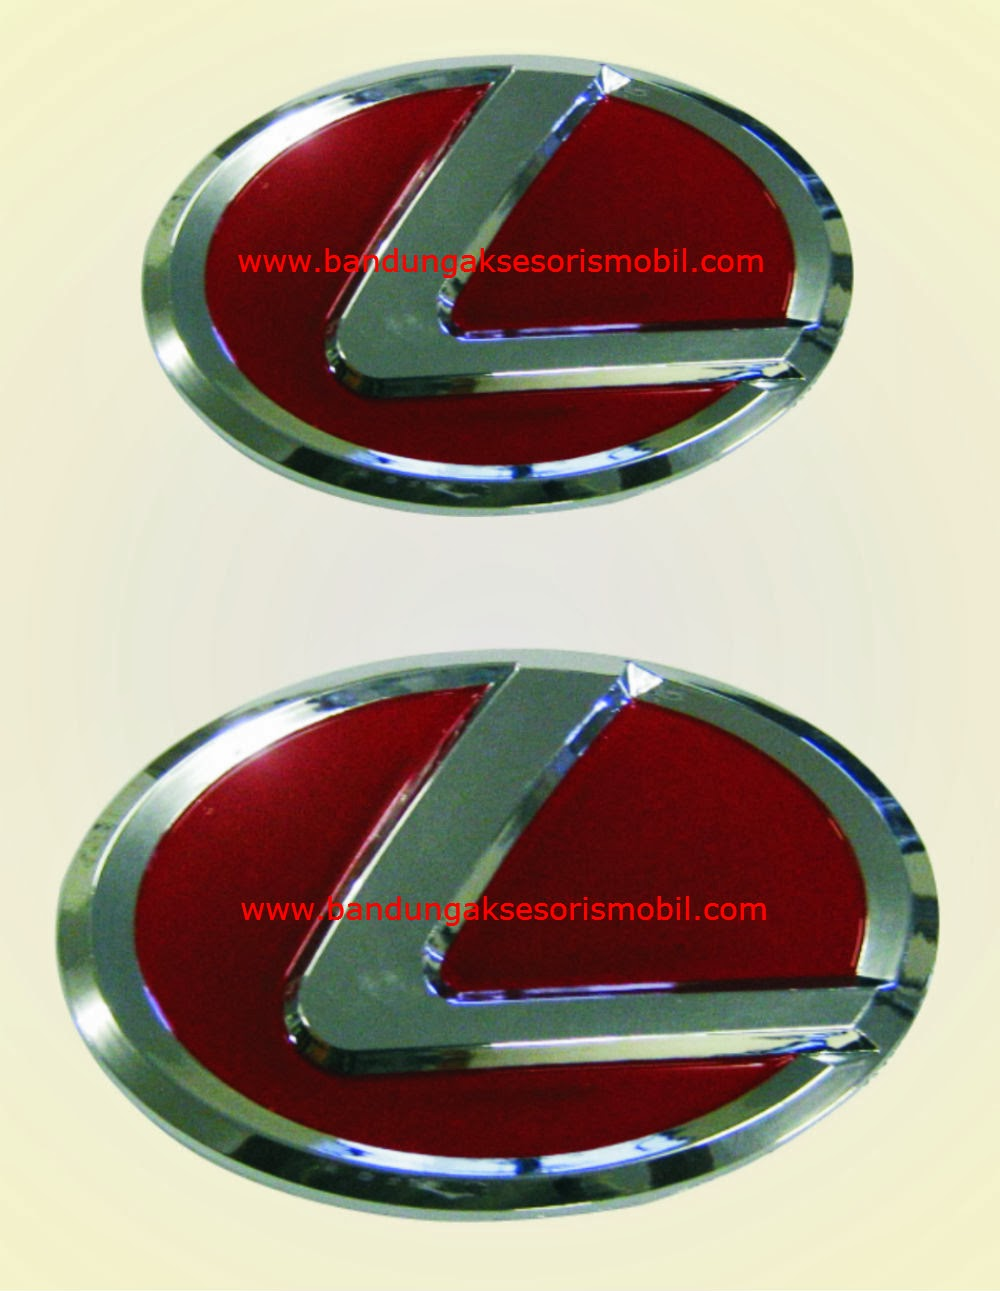 Emblem Paket Innova Model Lexus Merah